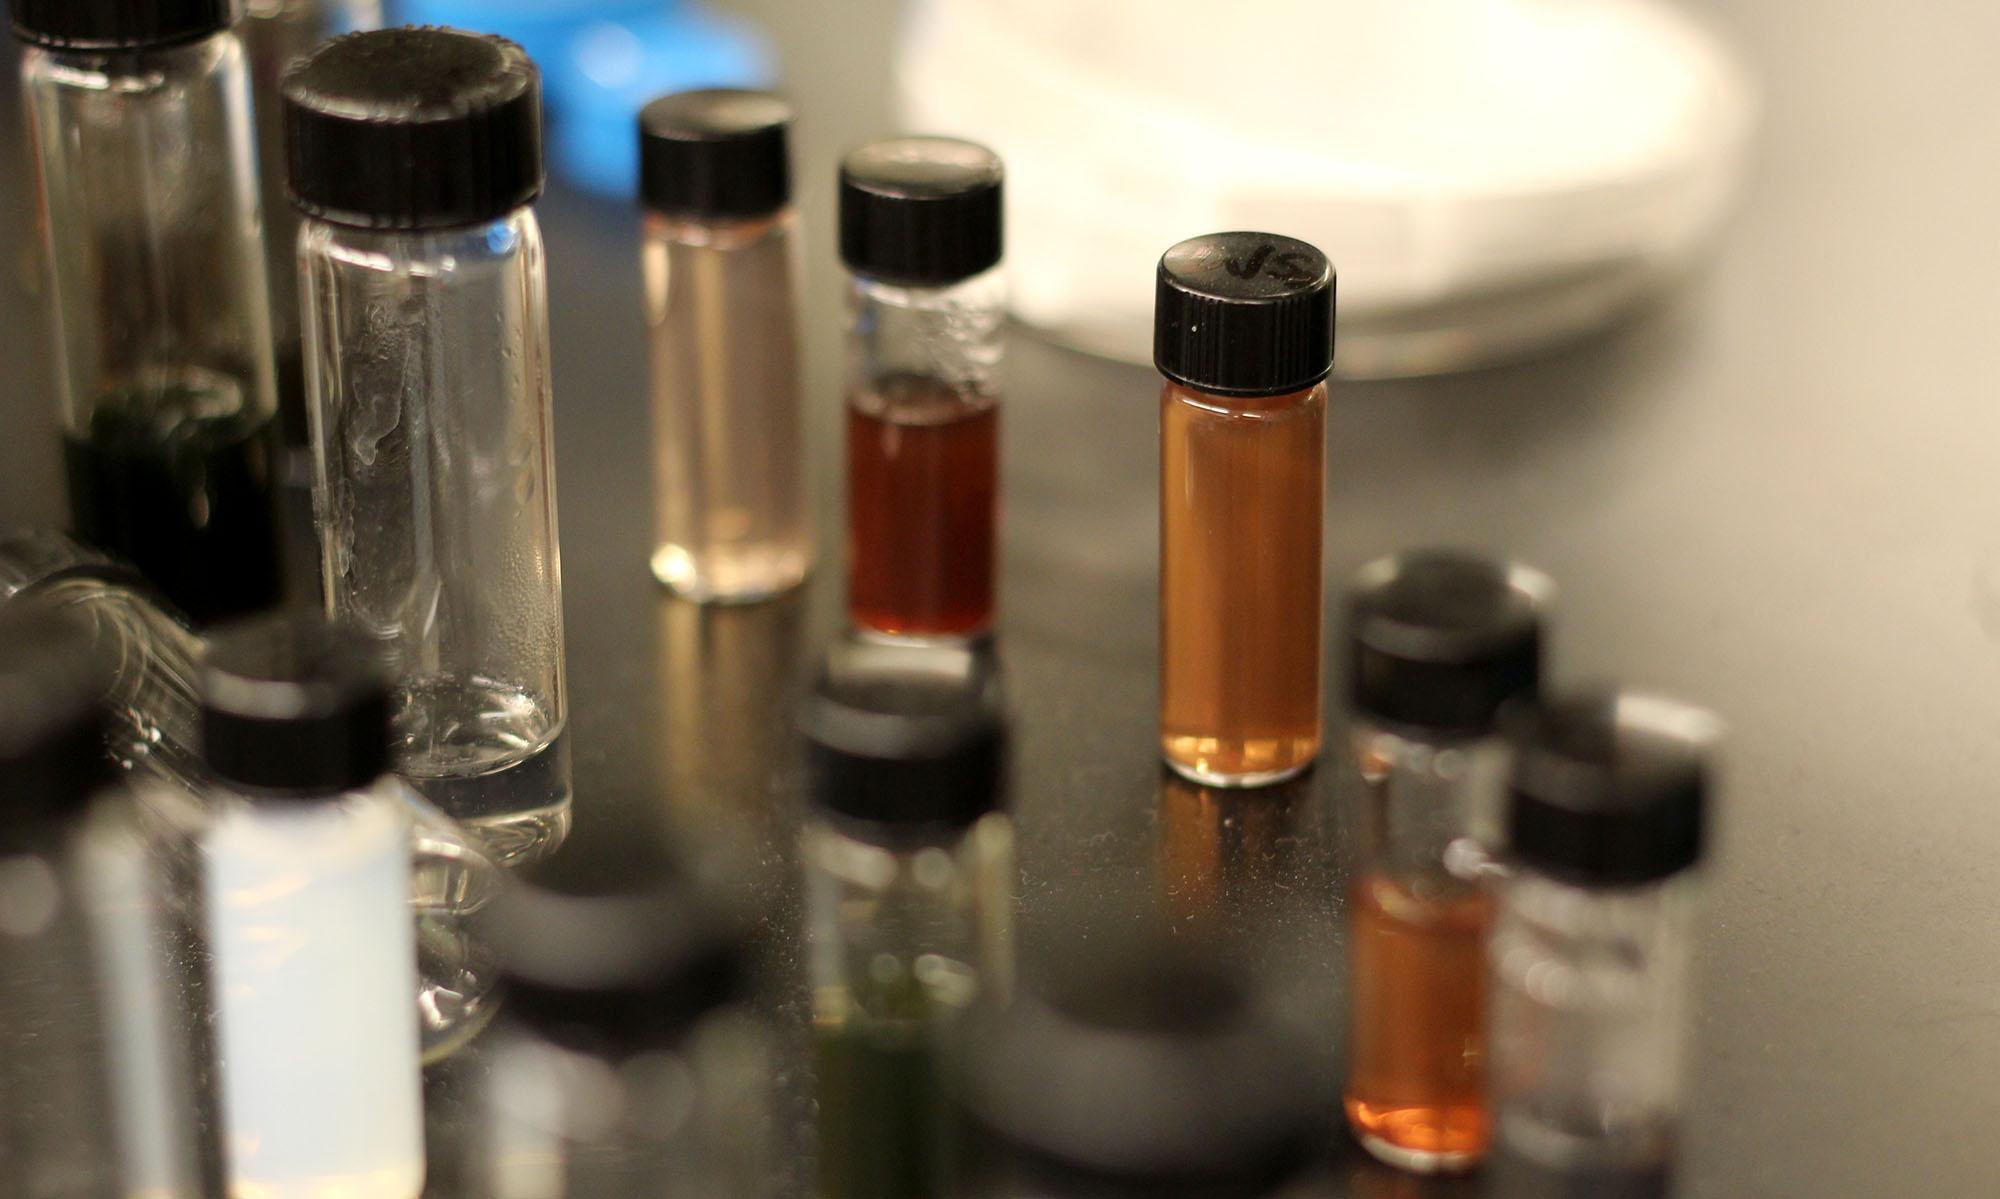 nanomaterial_vials2